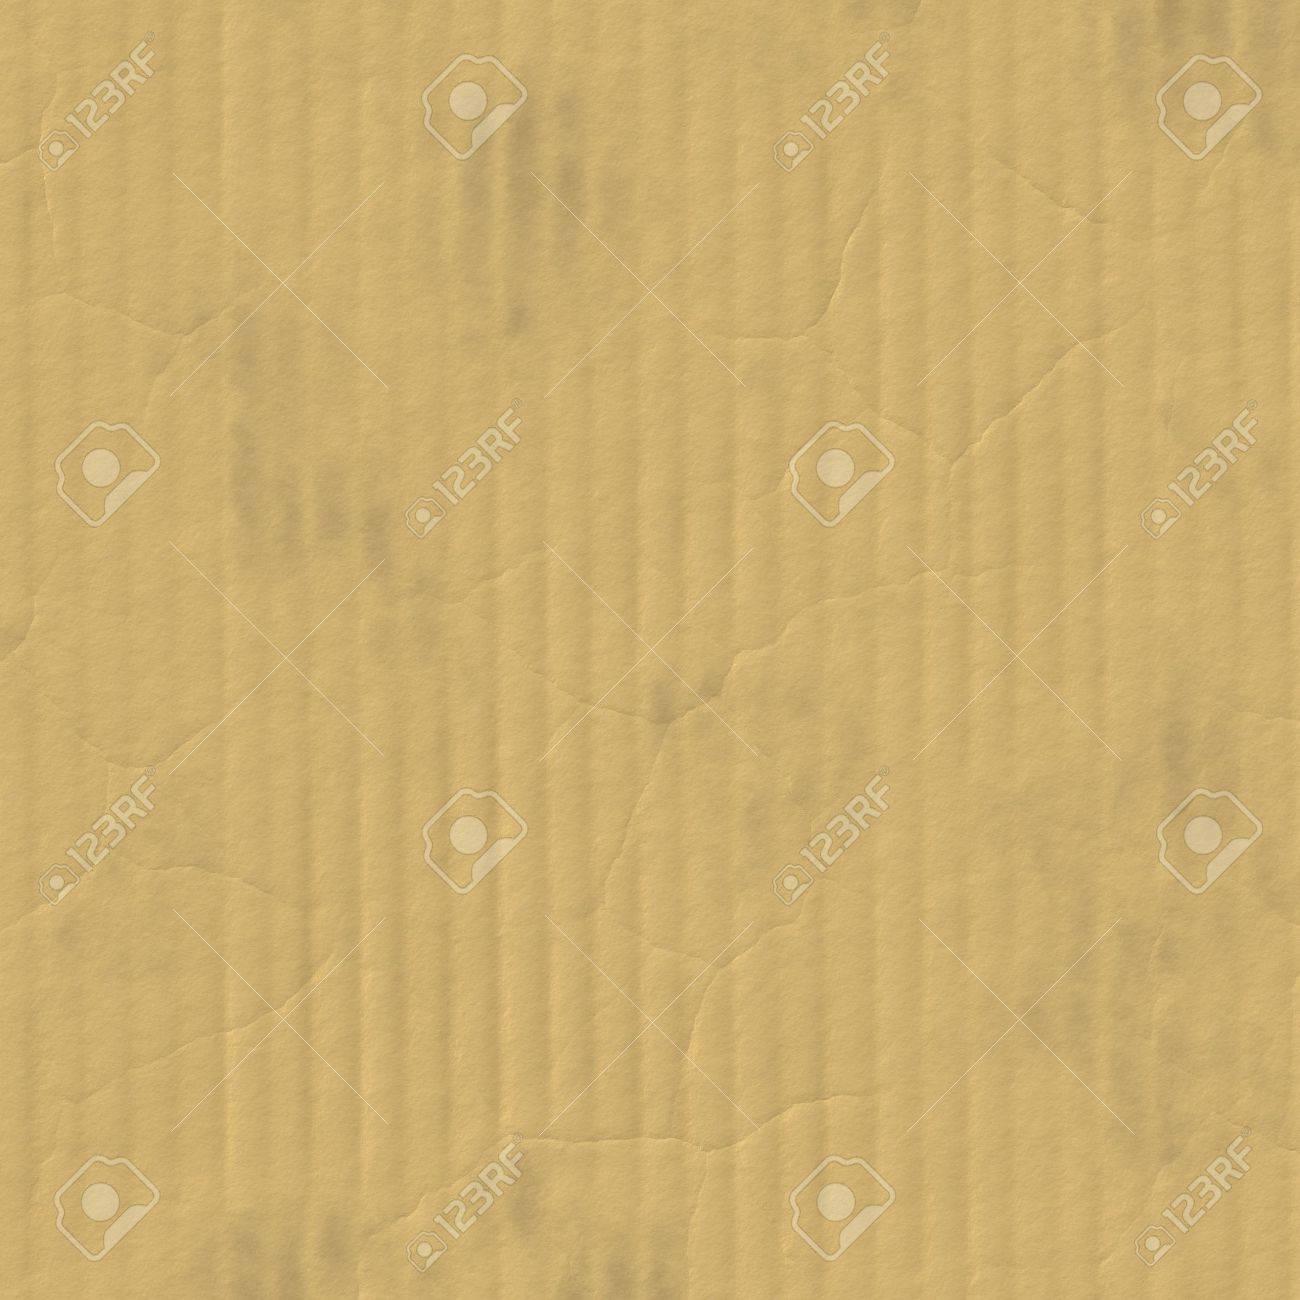 cardboard invoice Stock Photo - 6170649